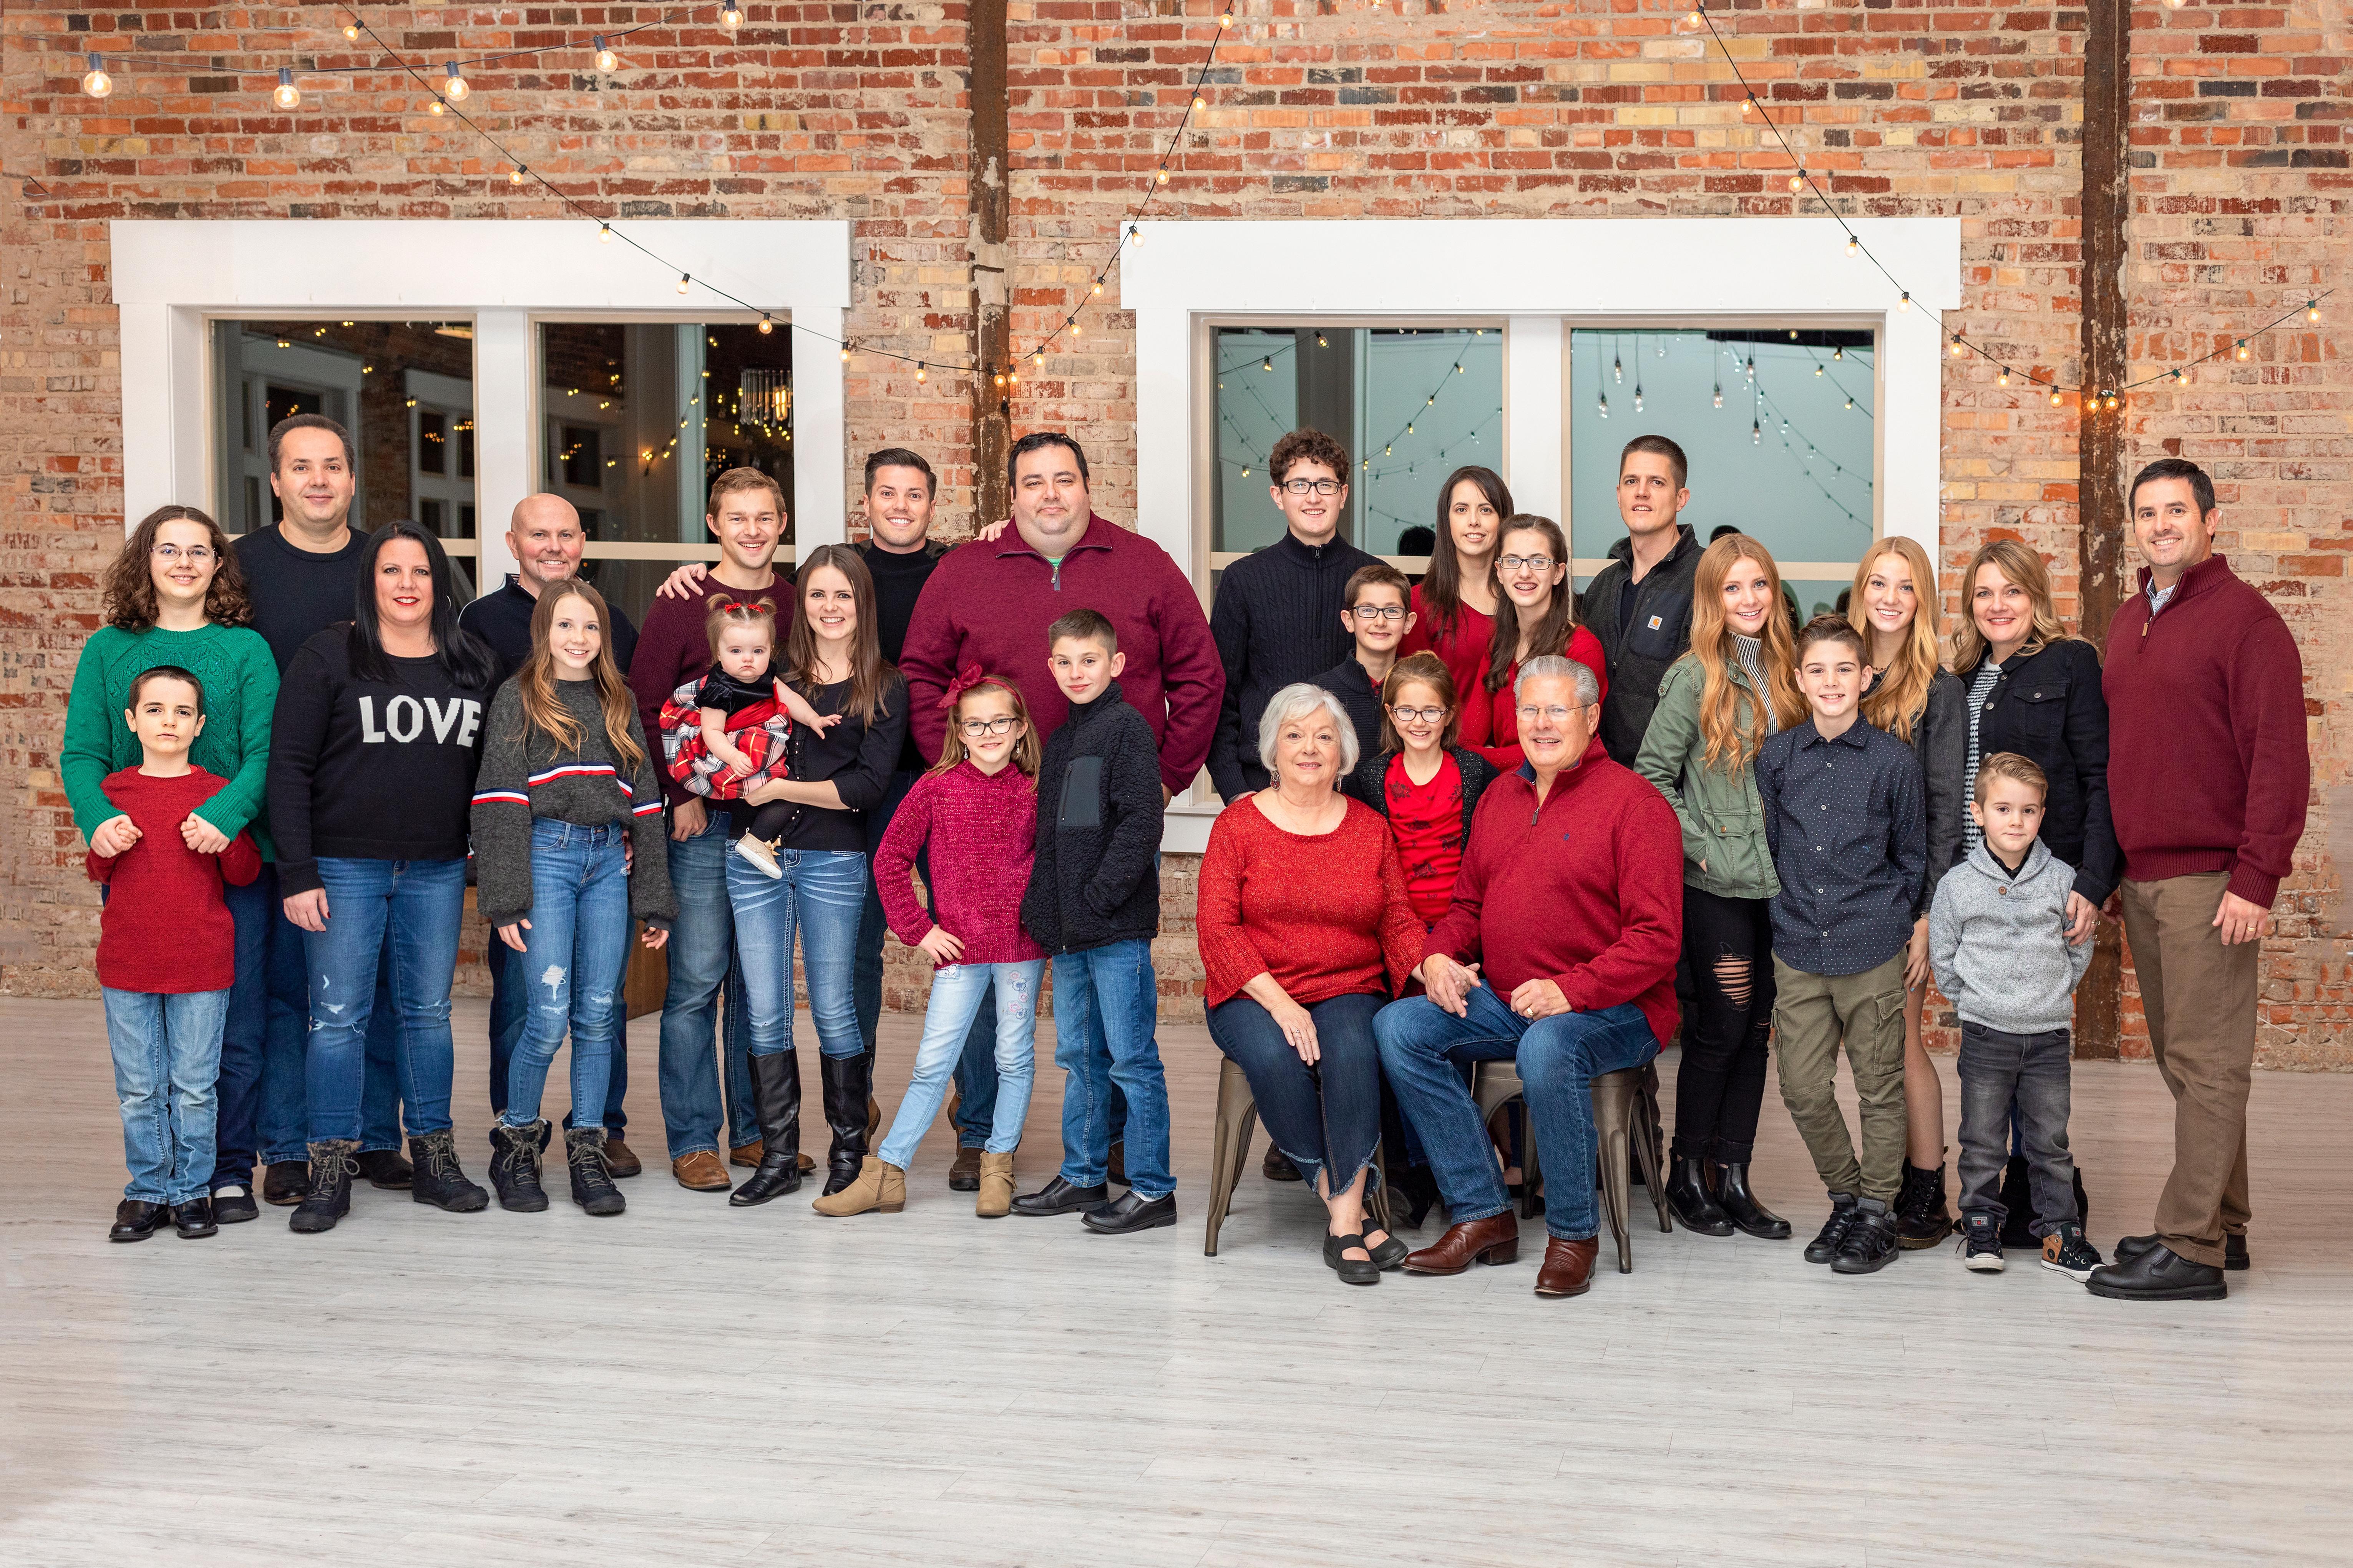 Heirloom Family Photoshoot